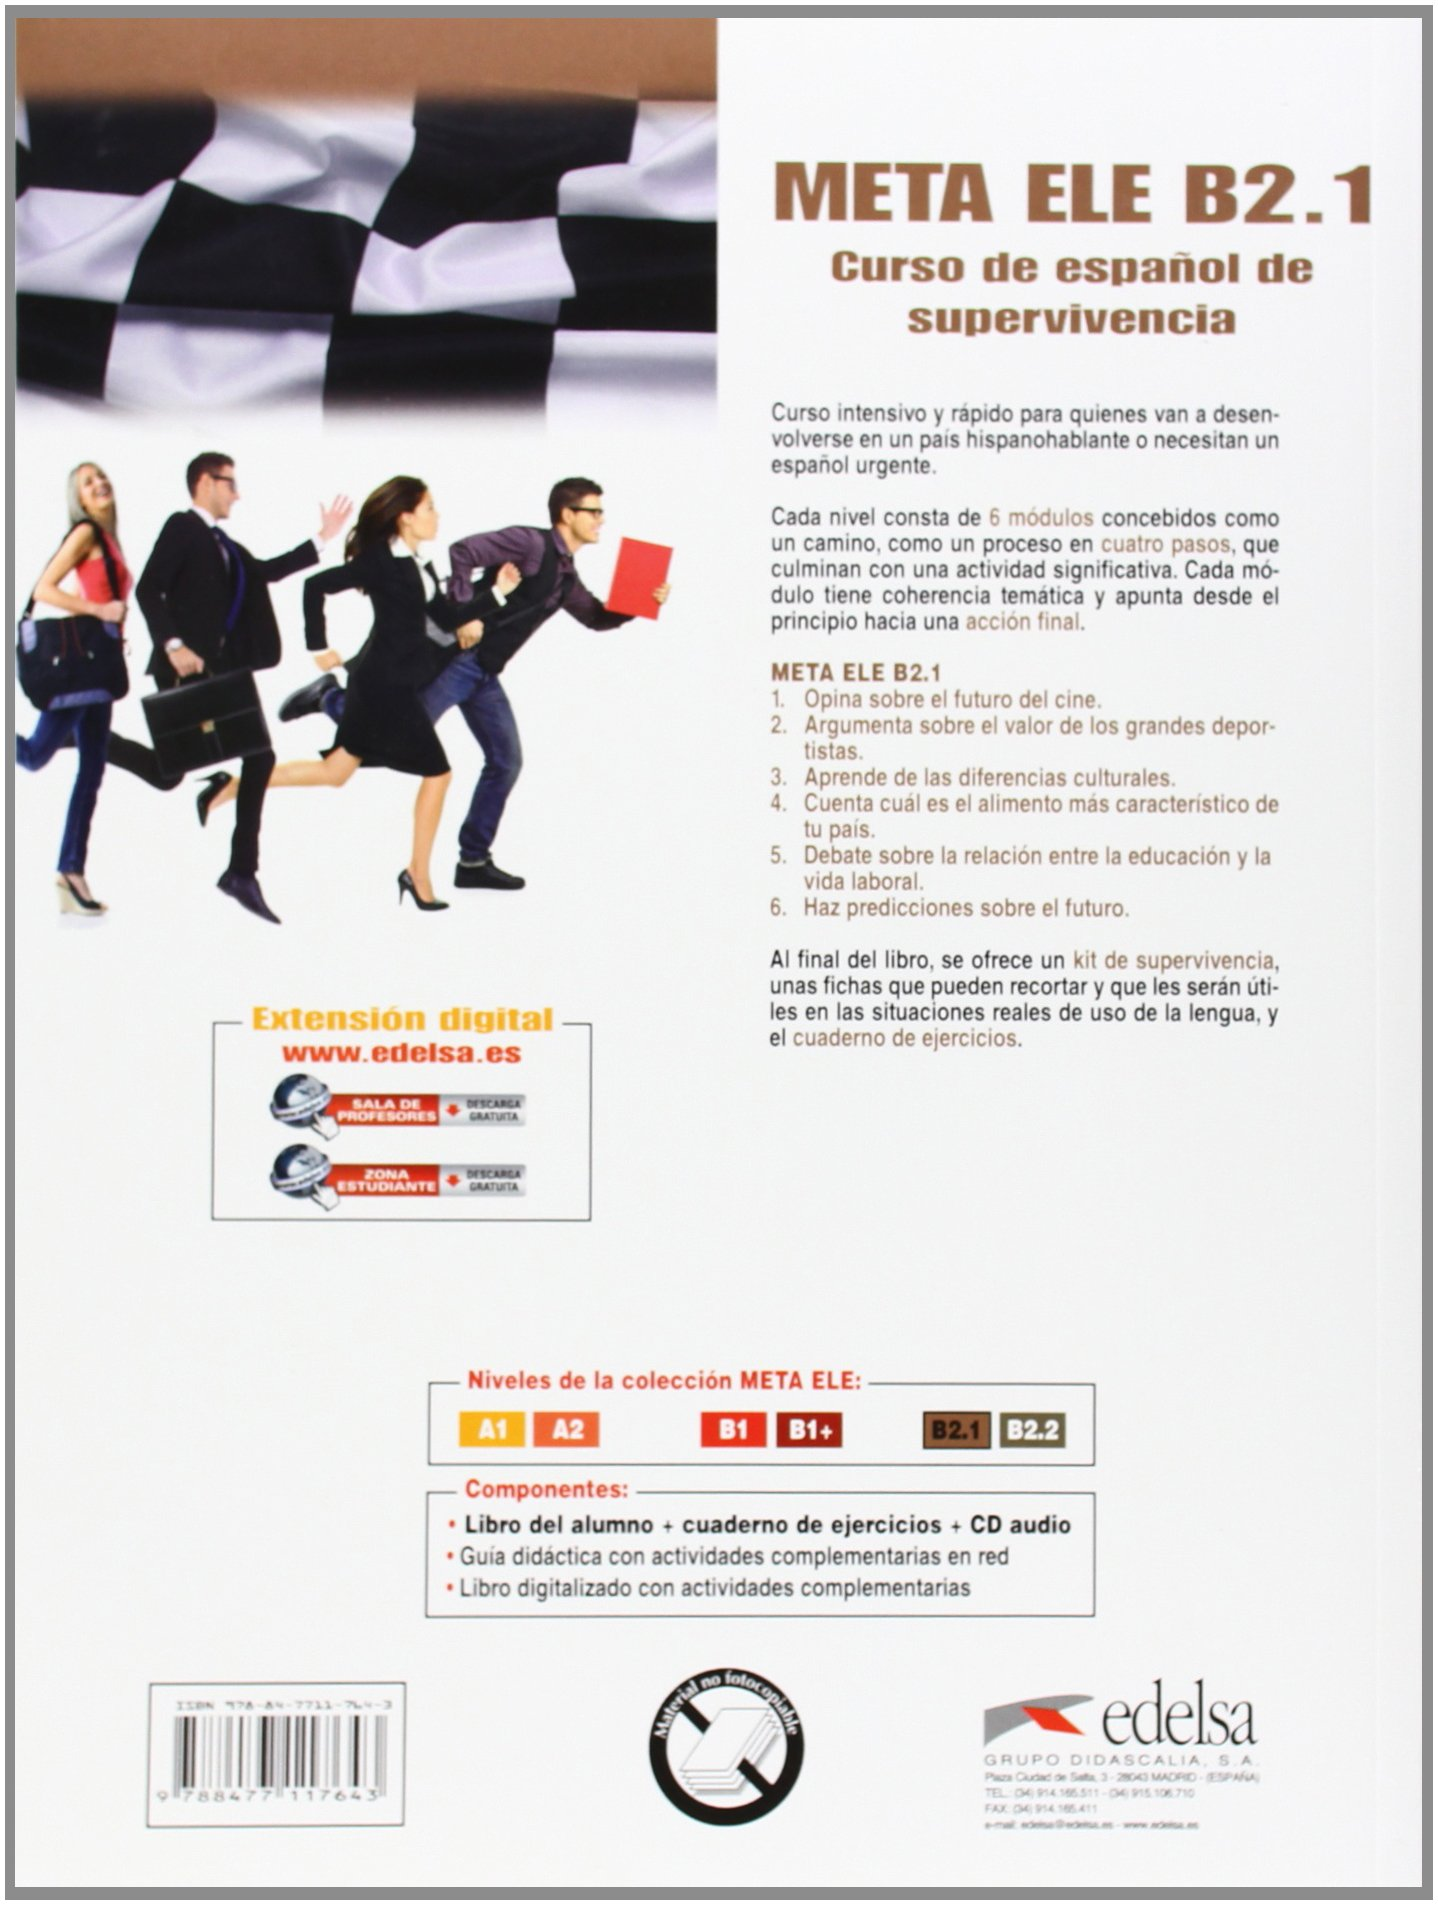 Que Significa Projected Release Date En Espanol